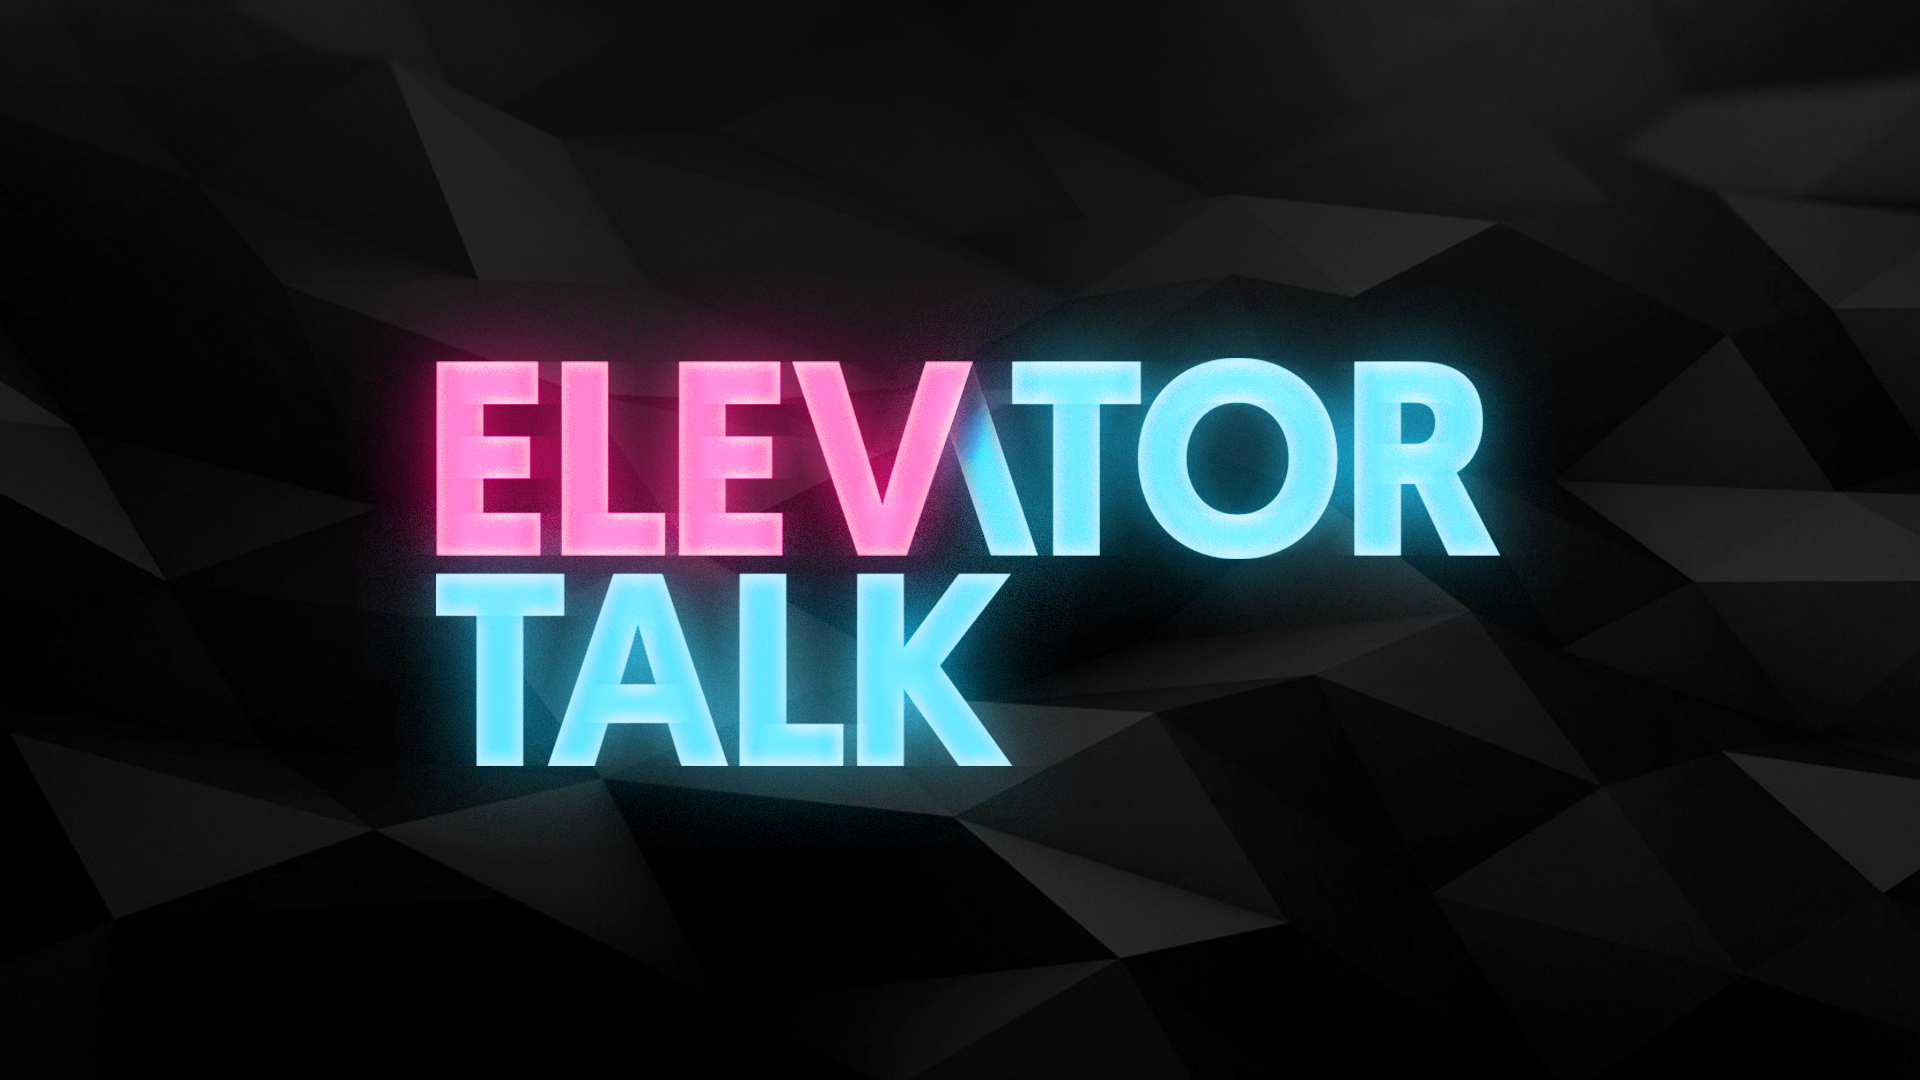 Elevator Talk Presented By BevNET